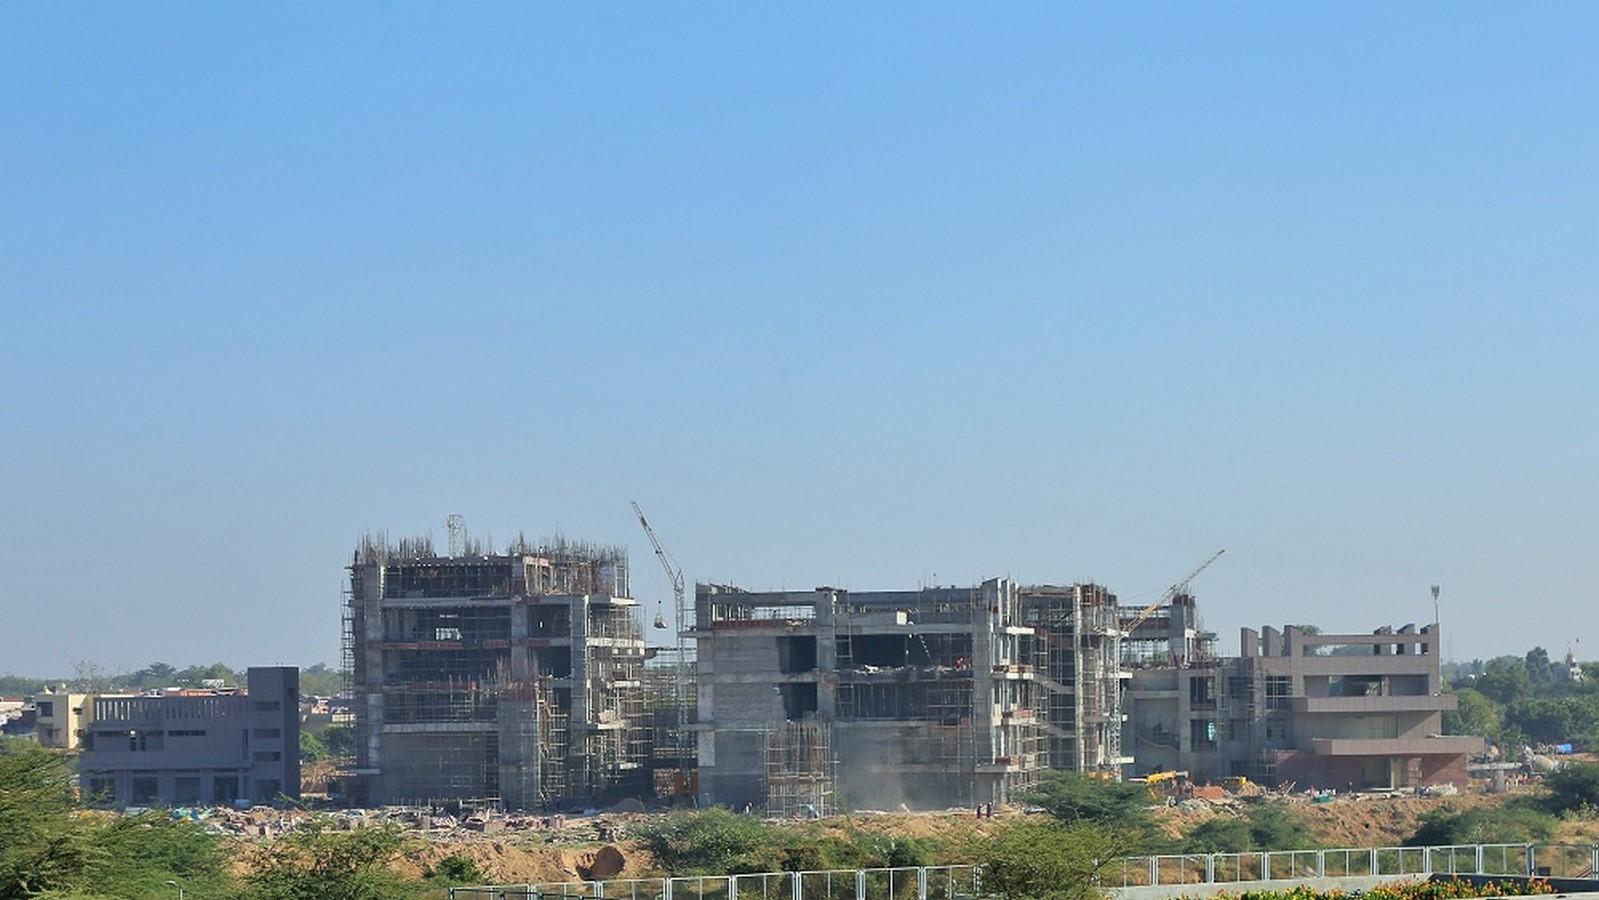 Architectural firms involved in designing the IIT Gandhinagar campus - Sheet13